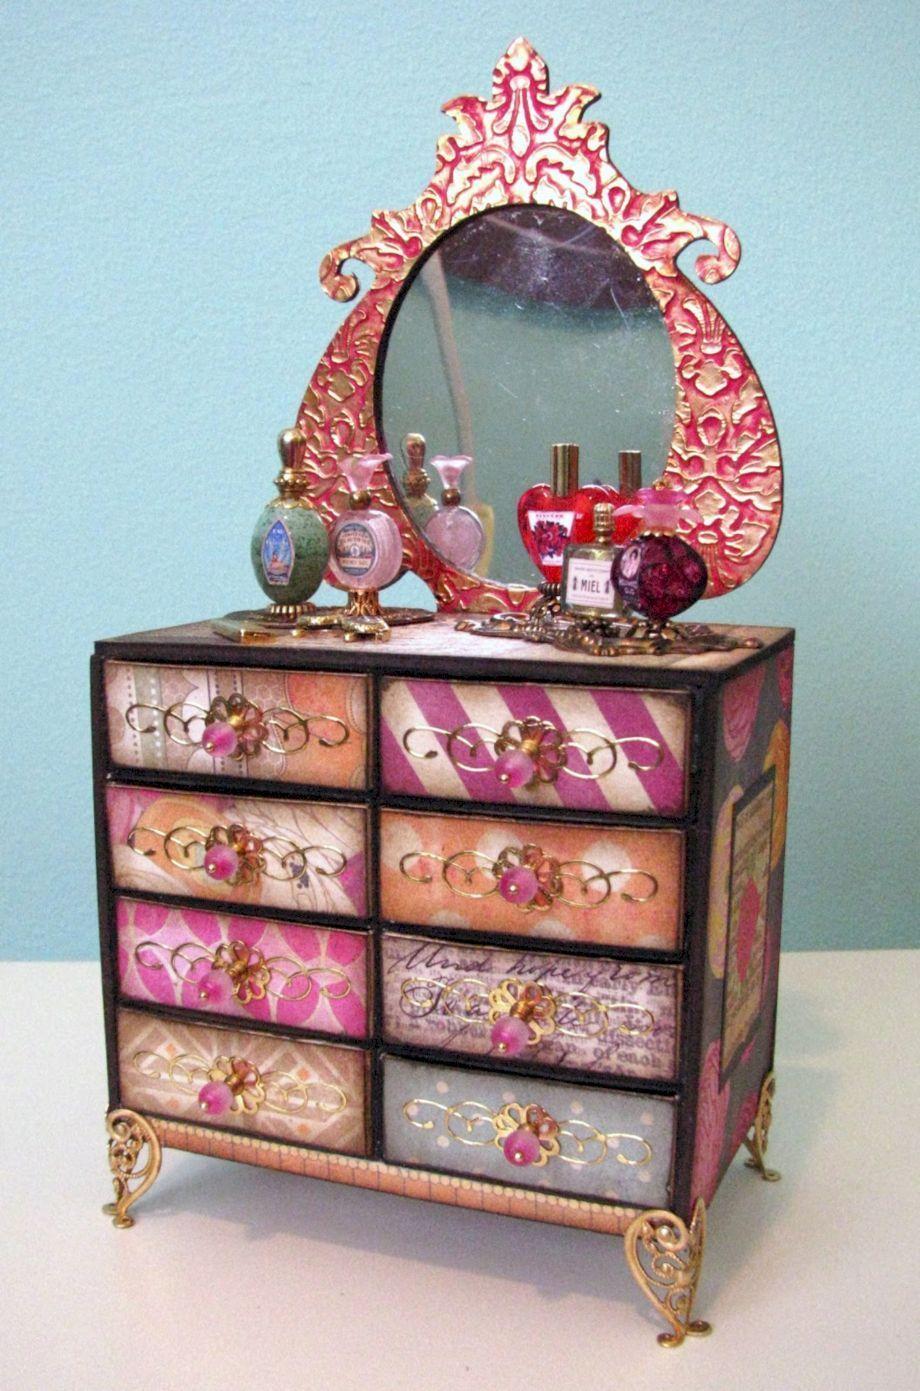 53 Cheap And Affordable Diy Barbie Doll Furniture Ideas Roundecor Doll Furniture Matchbox Crafts Barbie Furniture